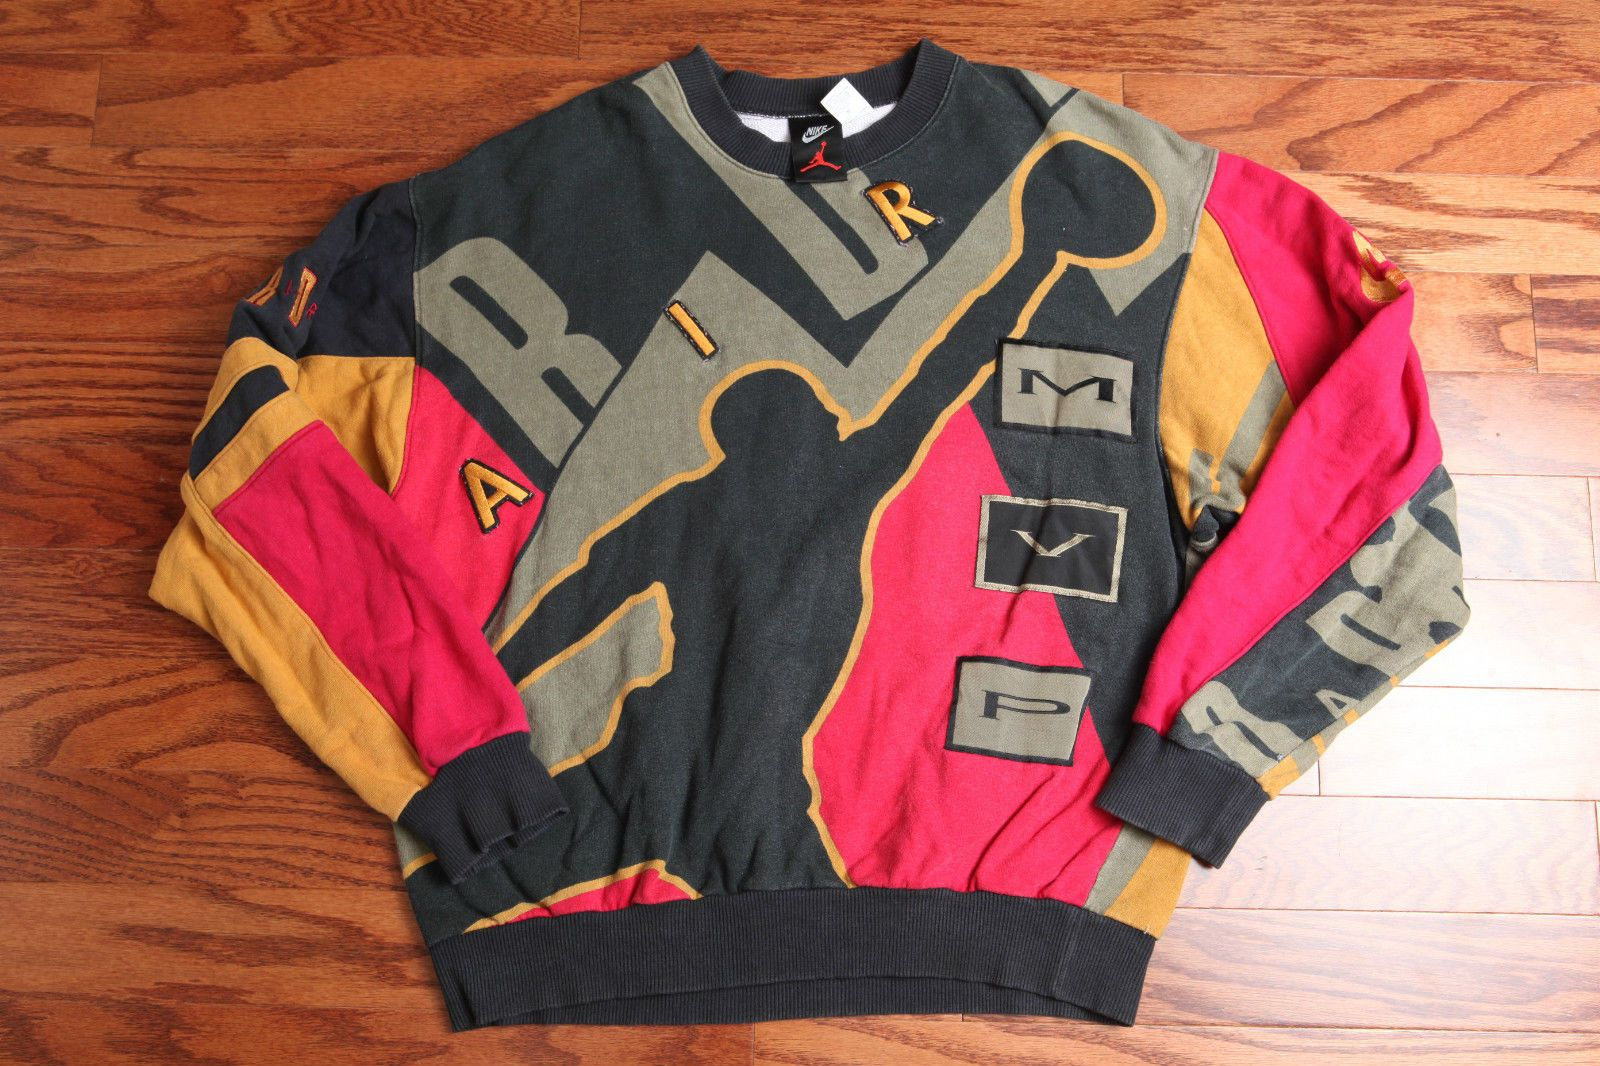 f6fdddcbb14e Men s vintage 90s Nike Air Jordan MVP print all over Sweatshirt Medium M  michael